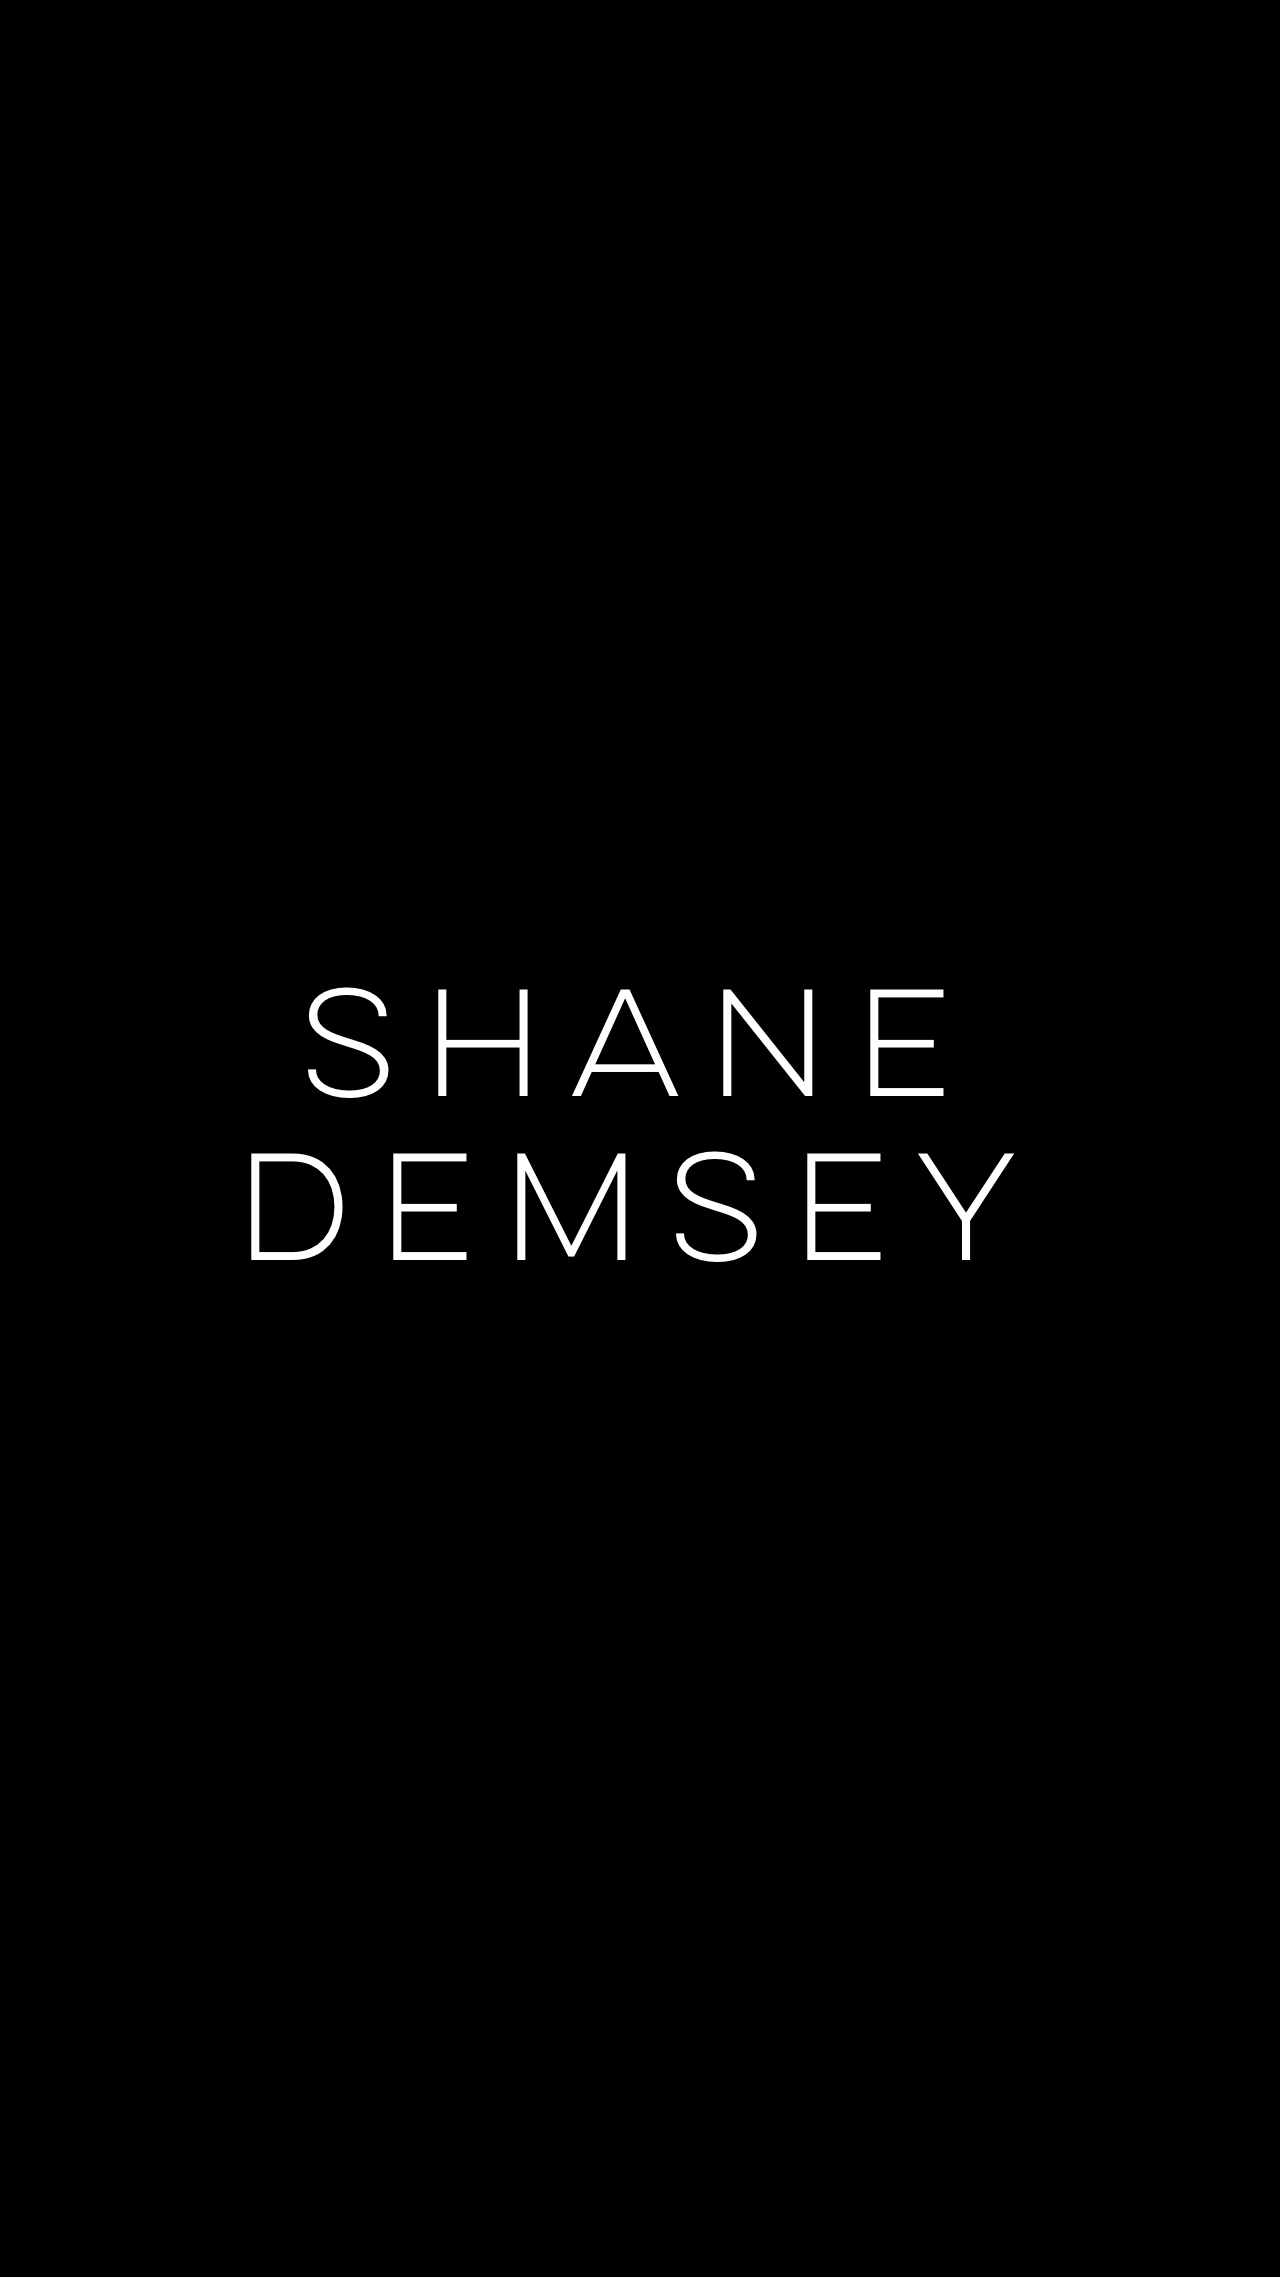 SHANE DEMSEY.jpg